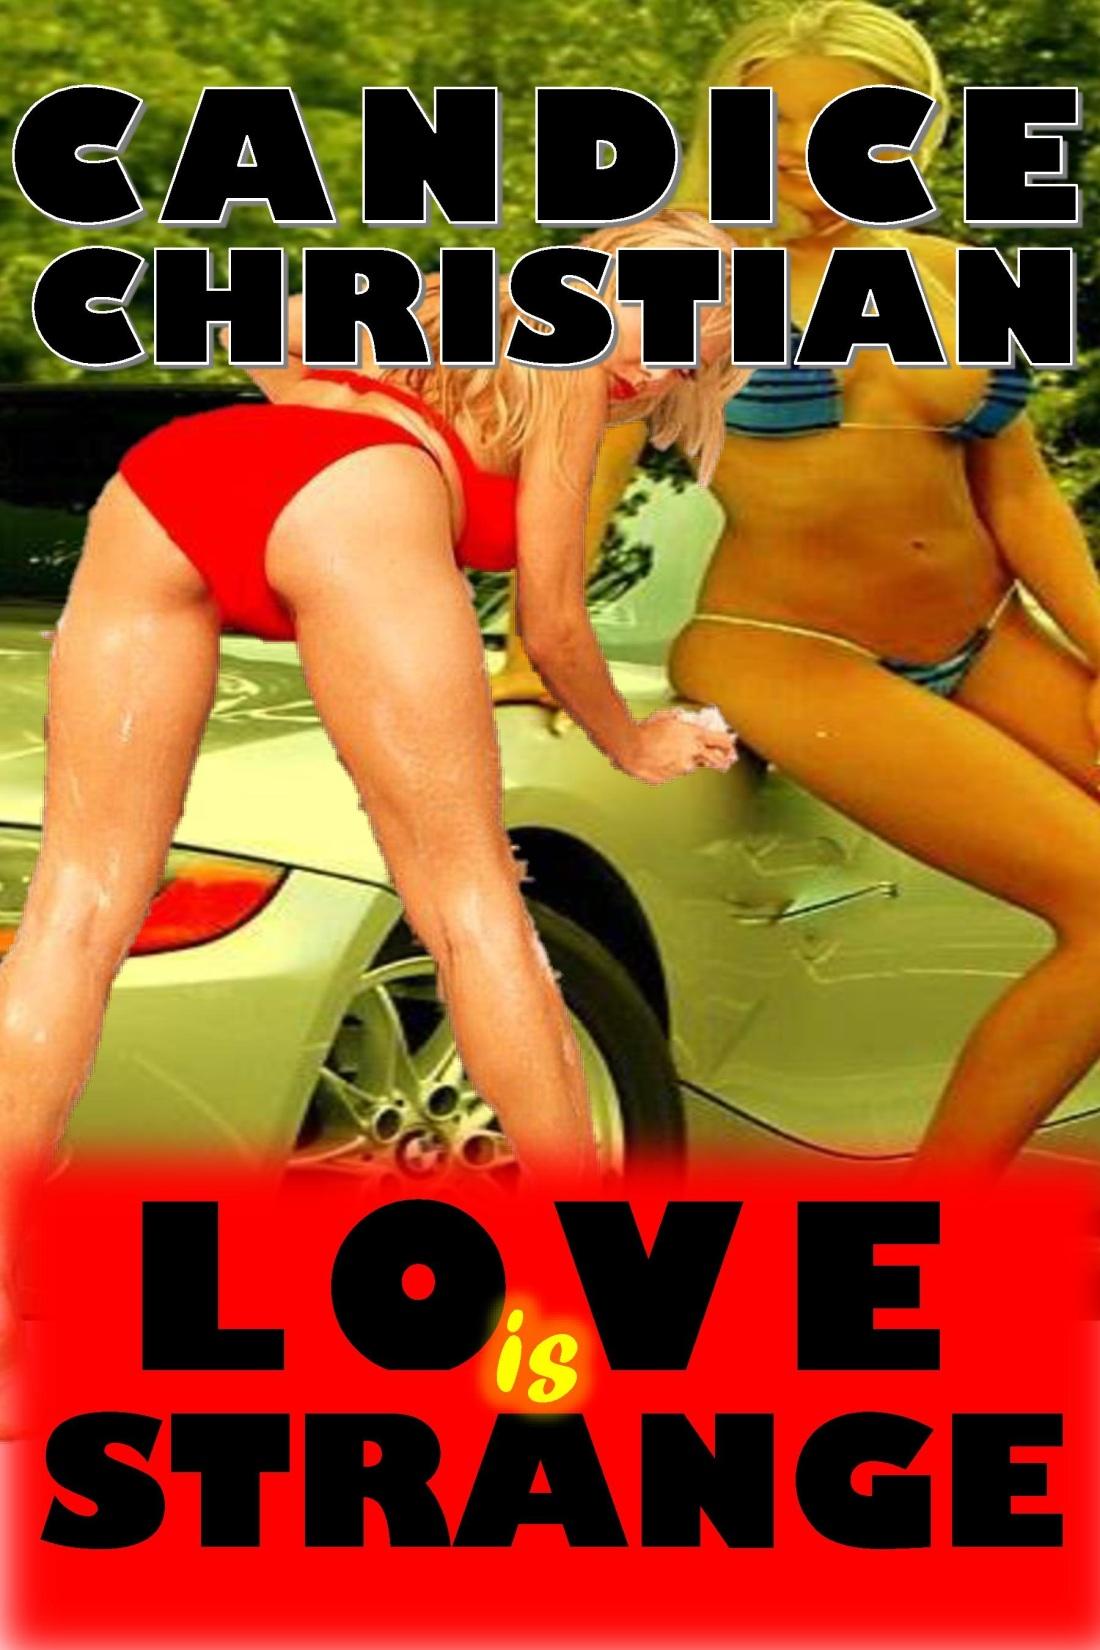 LOVE IS STRANGE COVER